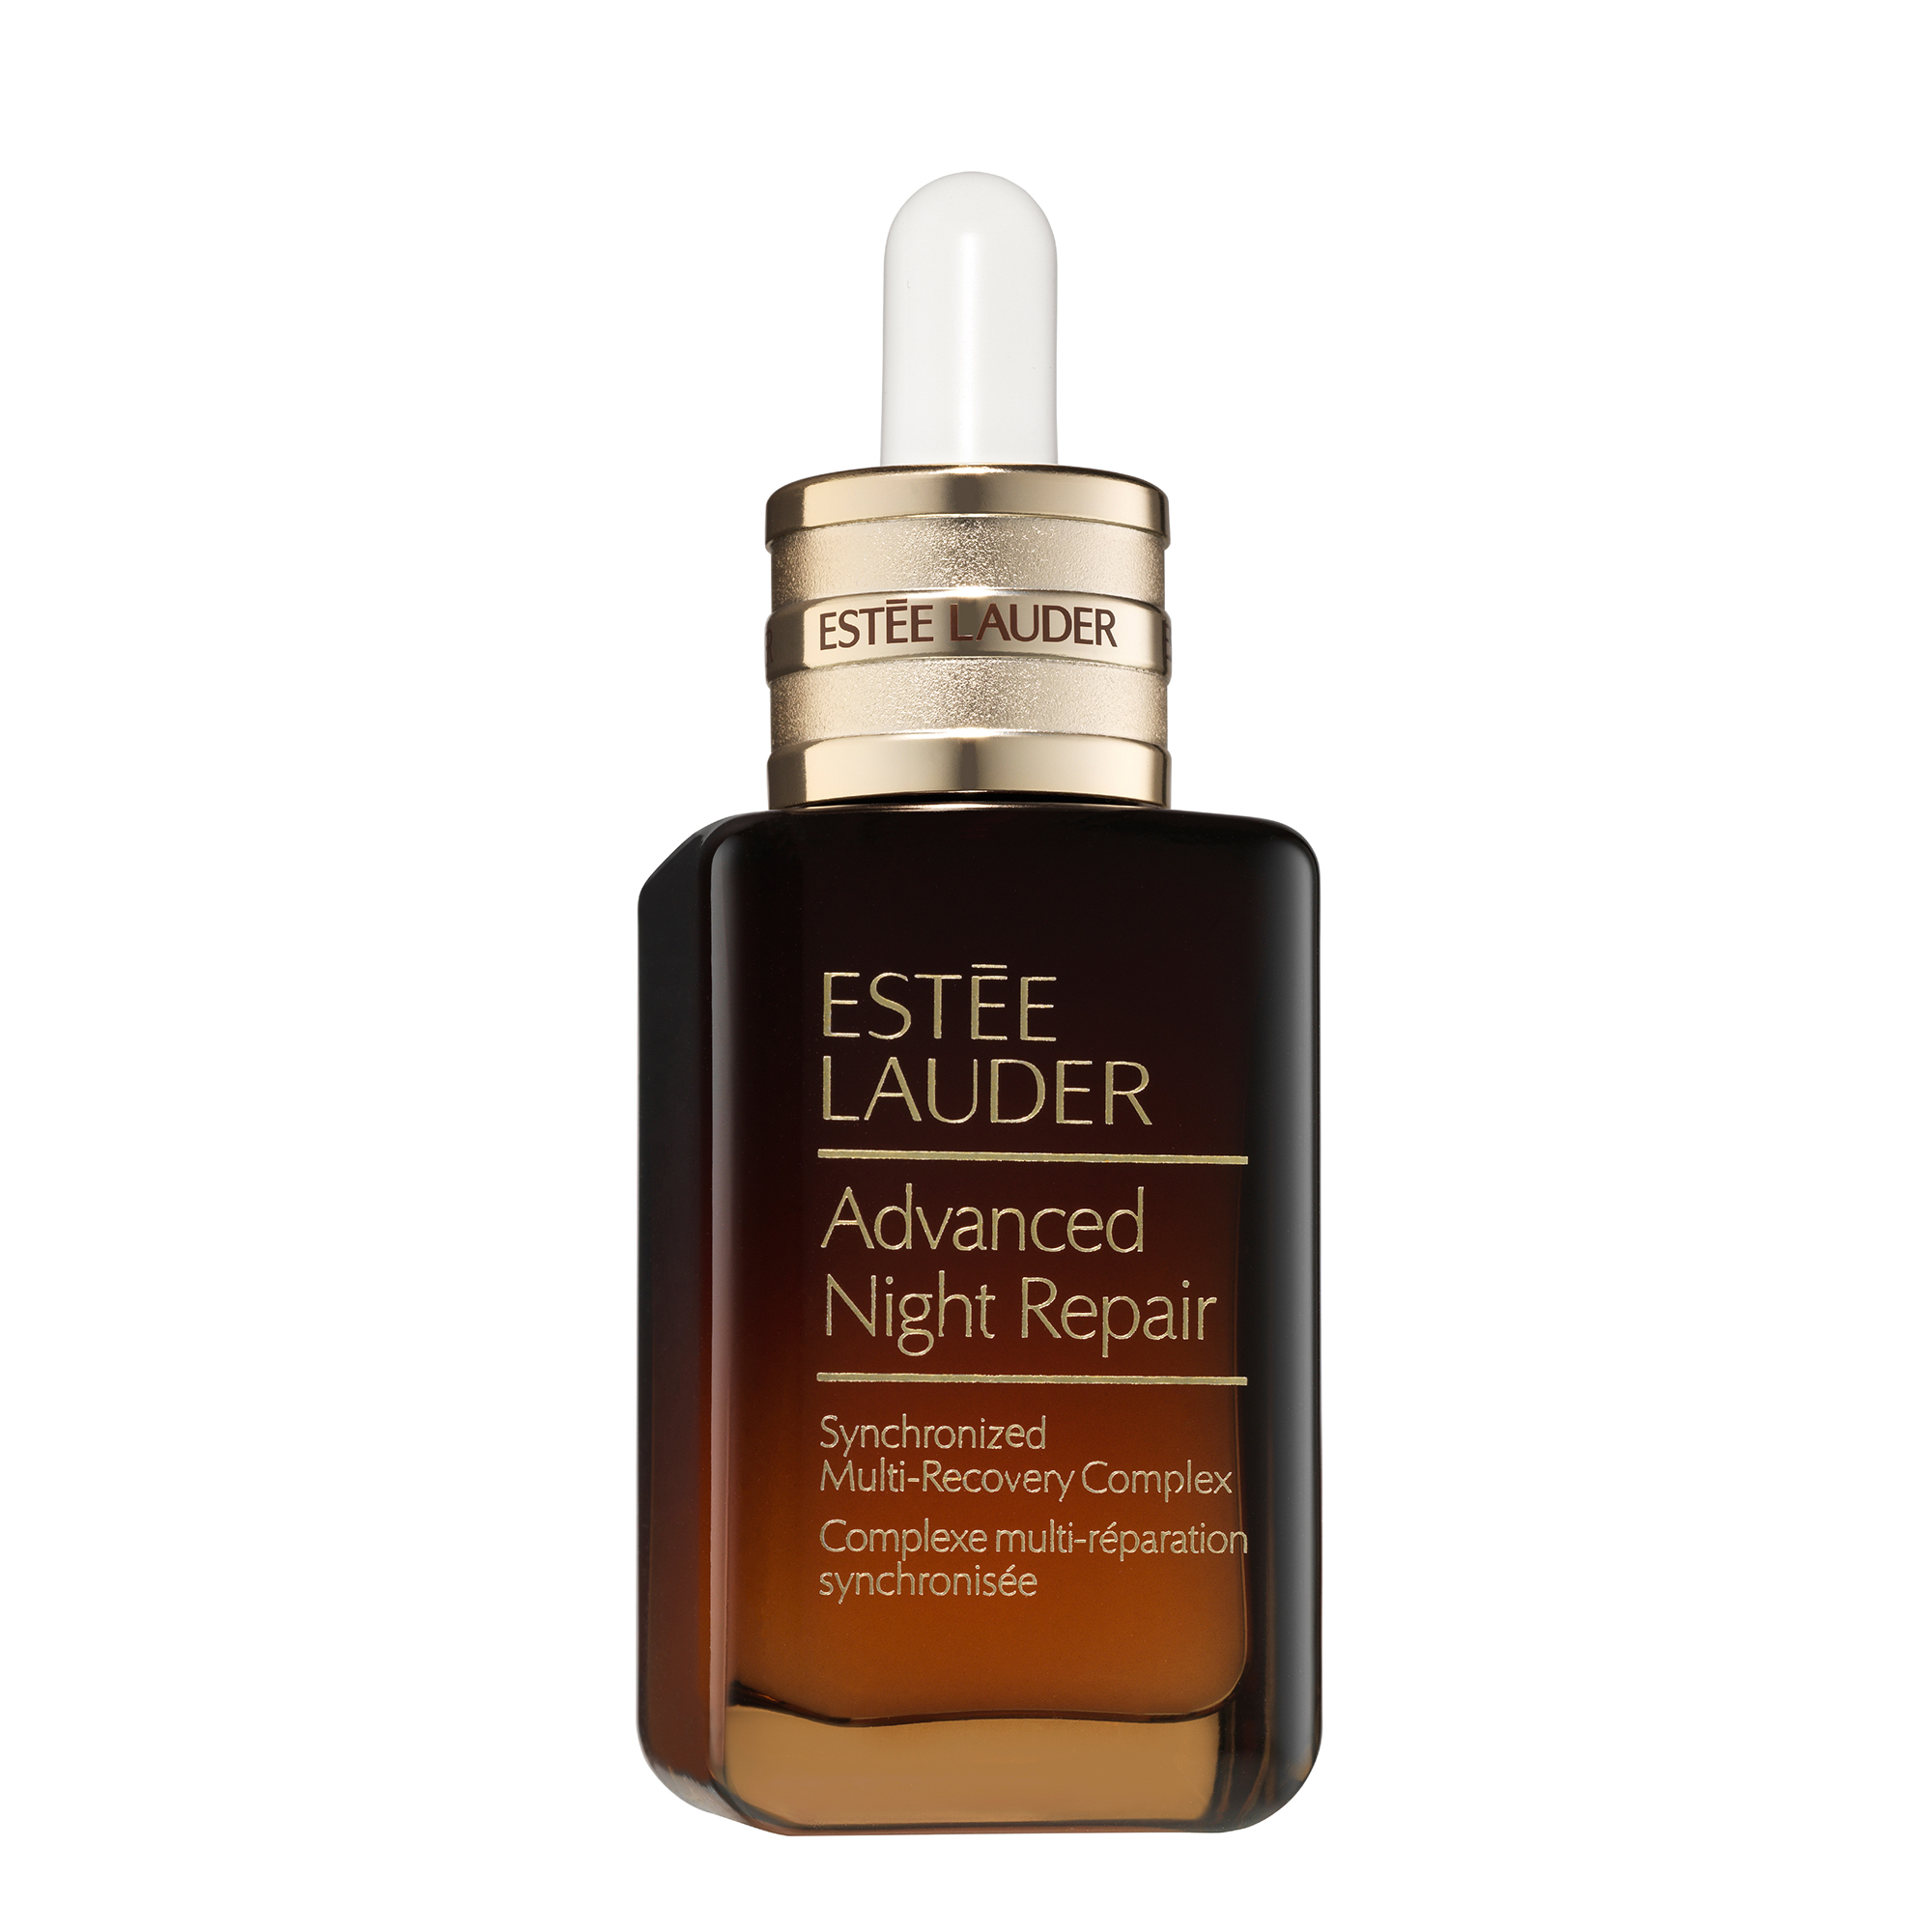 Estée Lauder Advanced Night Repair, 50 ml